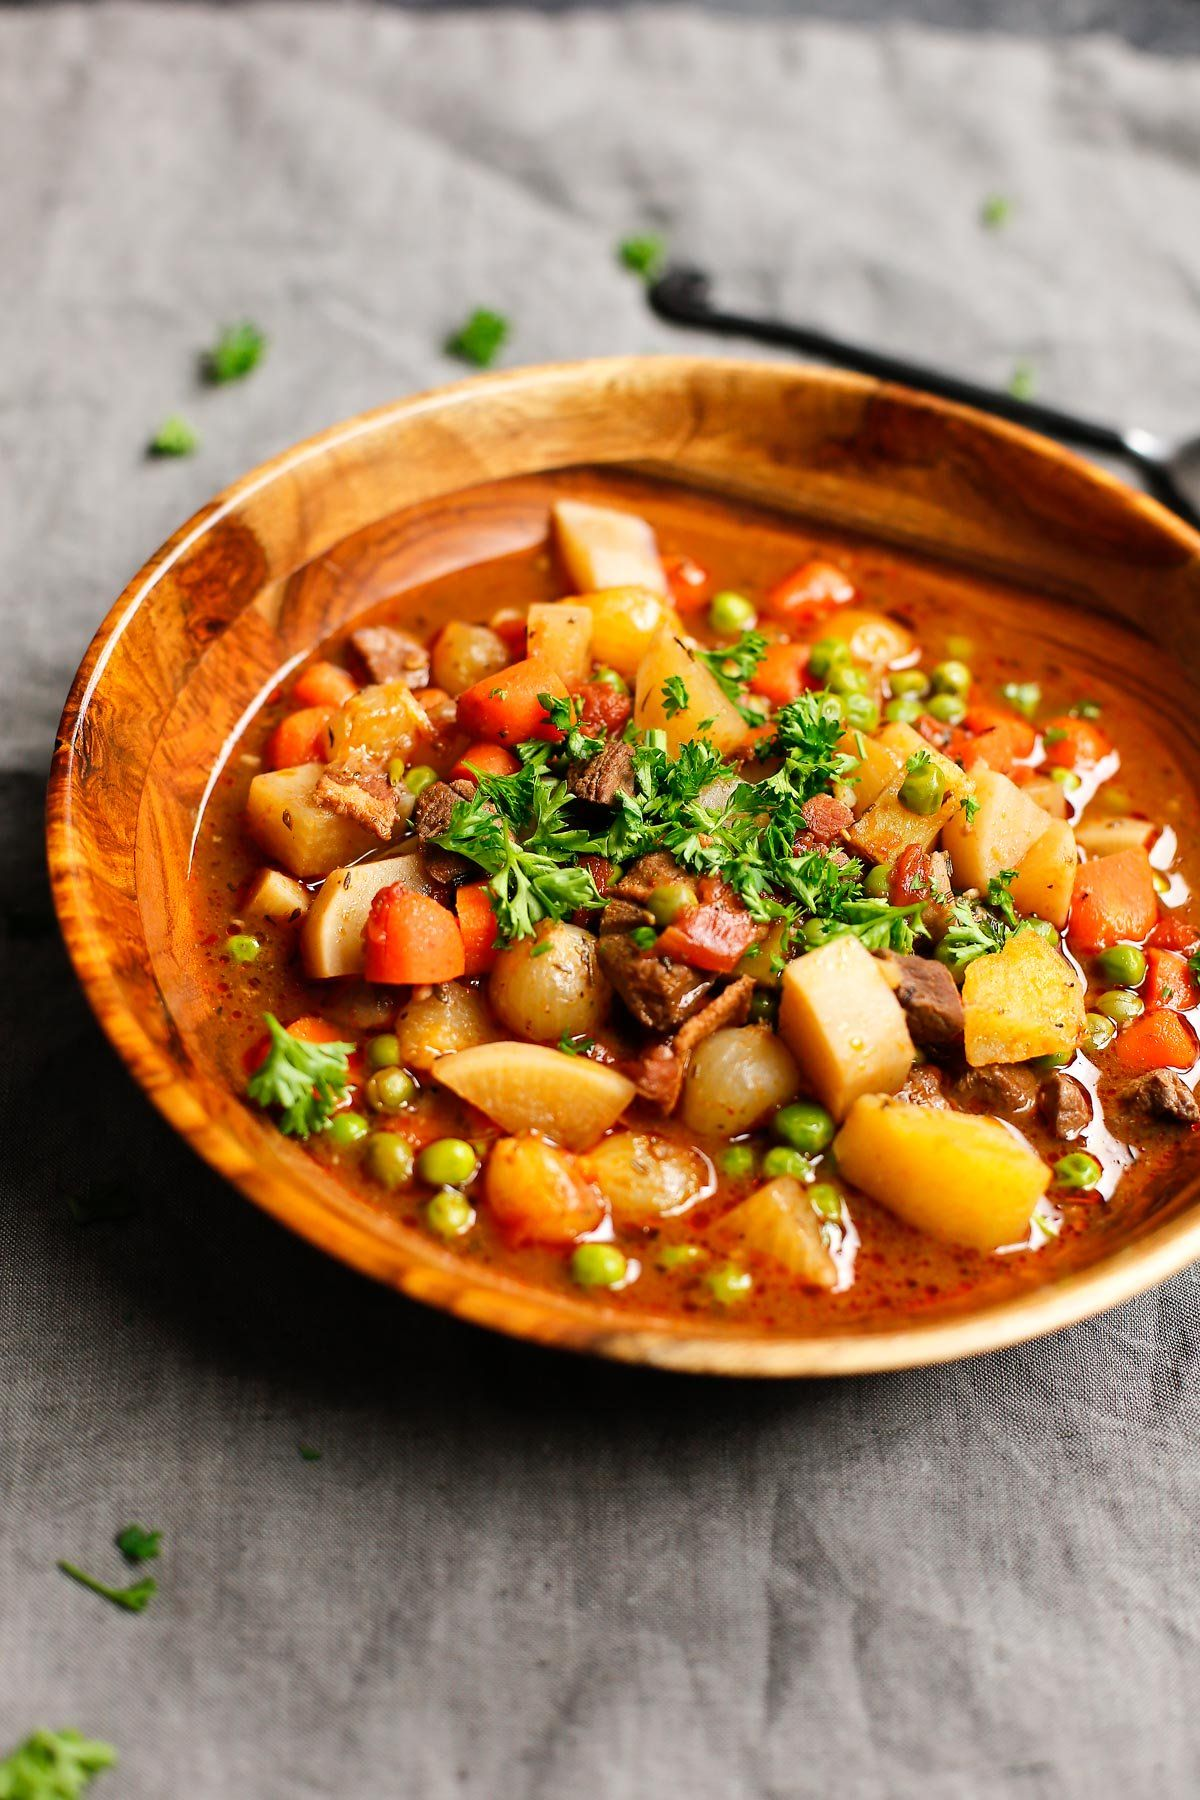 12 Of Ina Garten S Best Spring Recipes For Your Easter Feast In 2020 Spring Veggies Veggie Beef Stew Lamb Stew